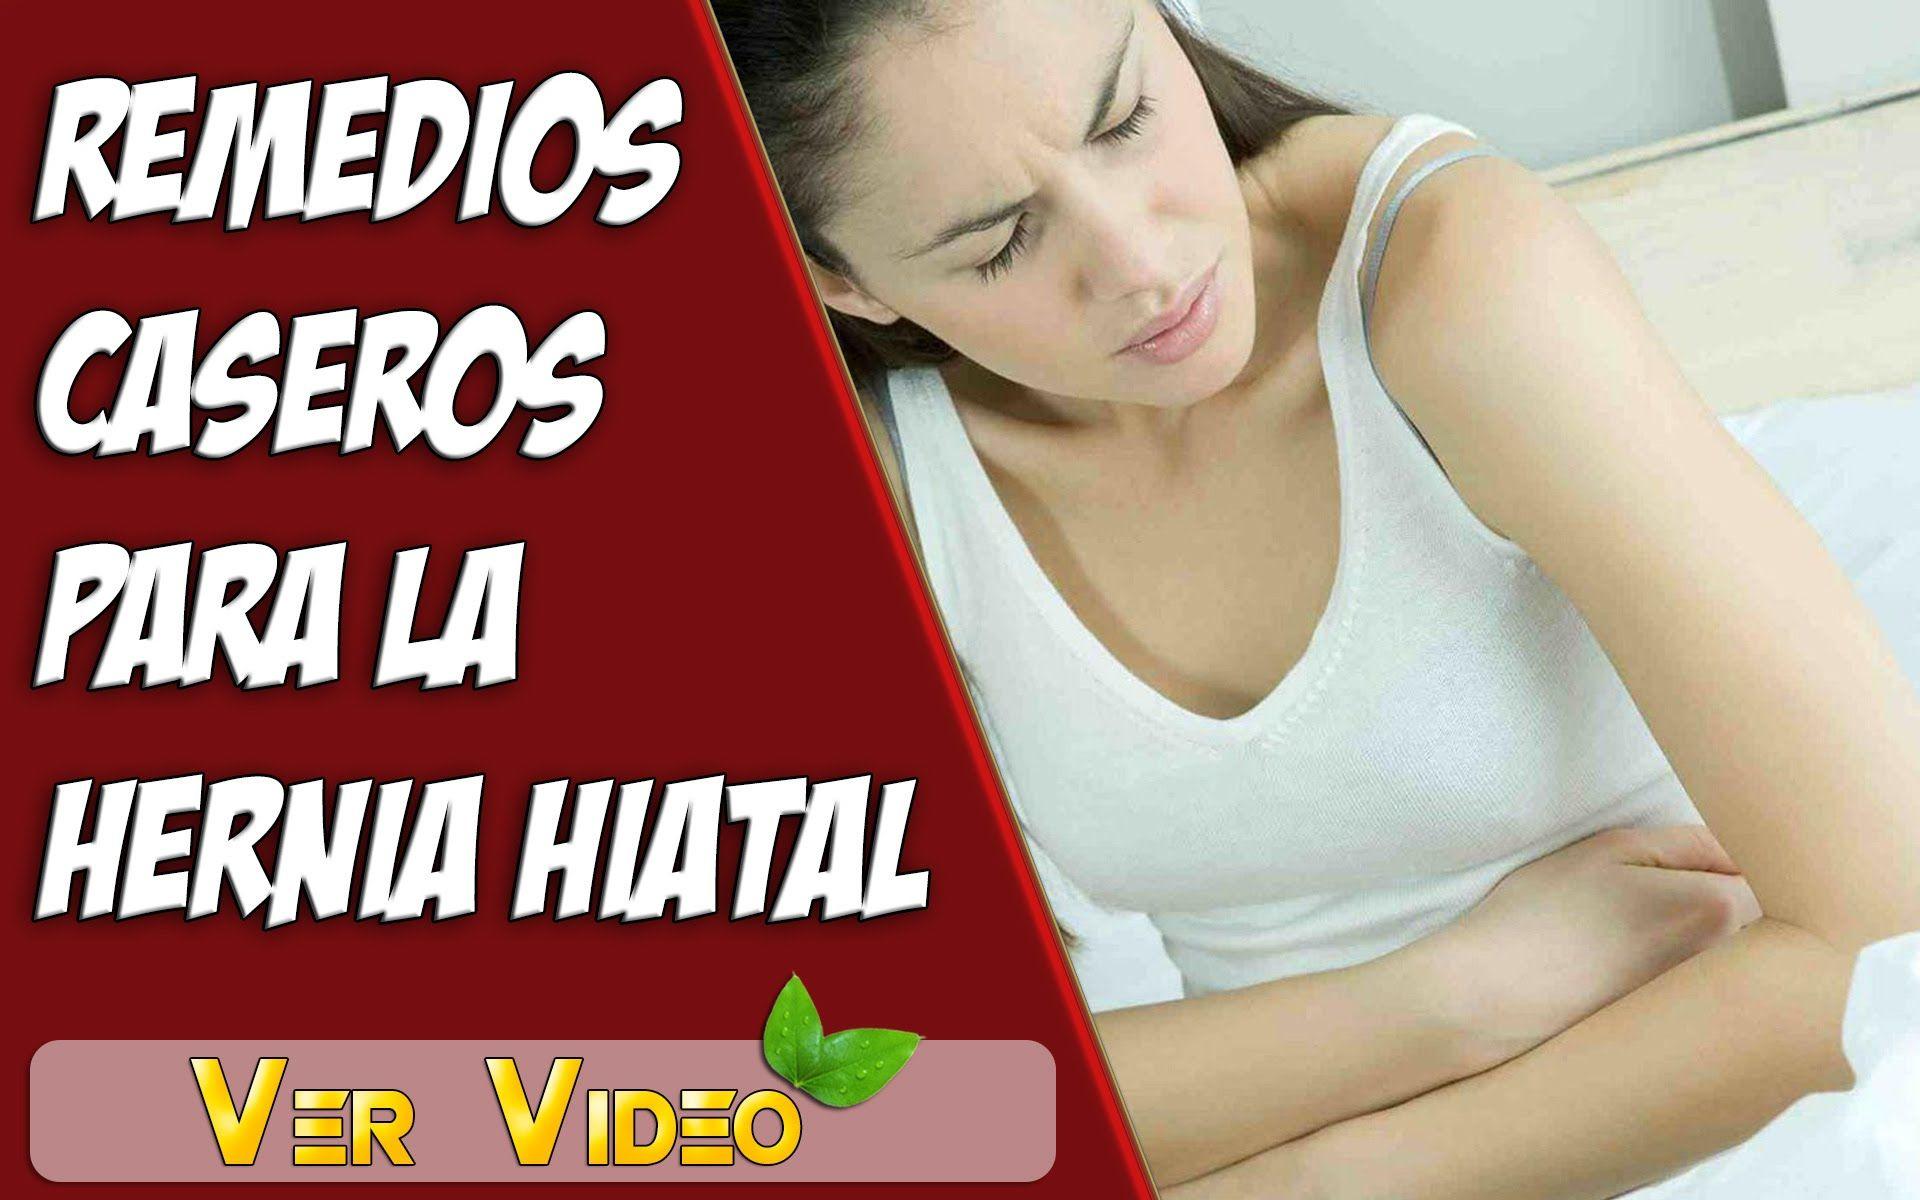 Remedios Caseros Para Hernia De Hiato Remedios Para Hernia Hiatal Hernia De Hiato Hernia Remedios Caseros